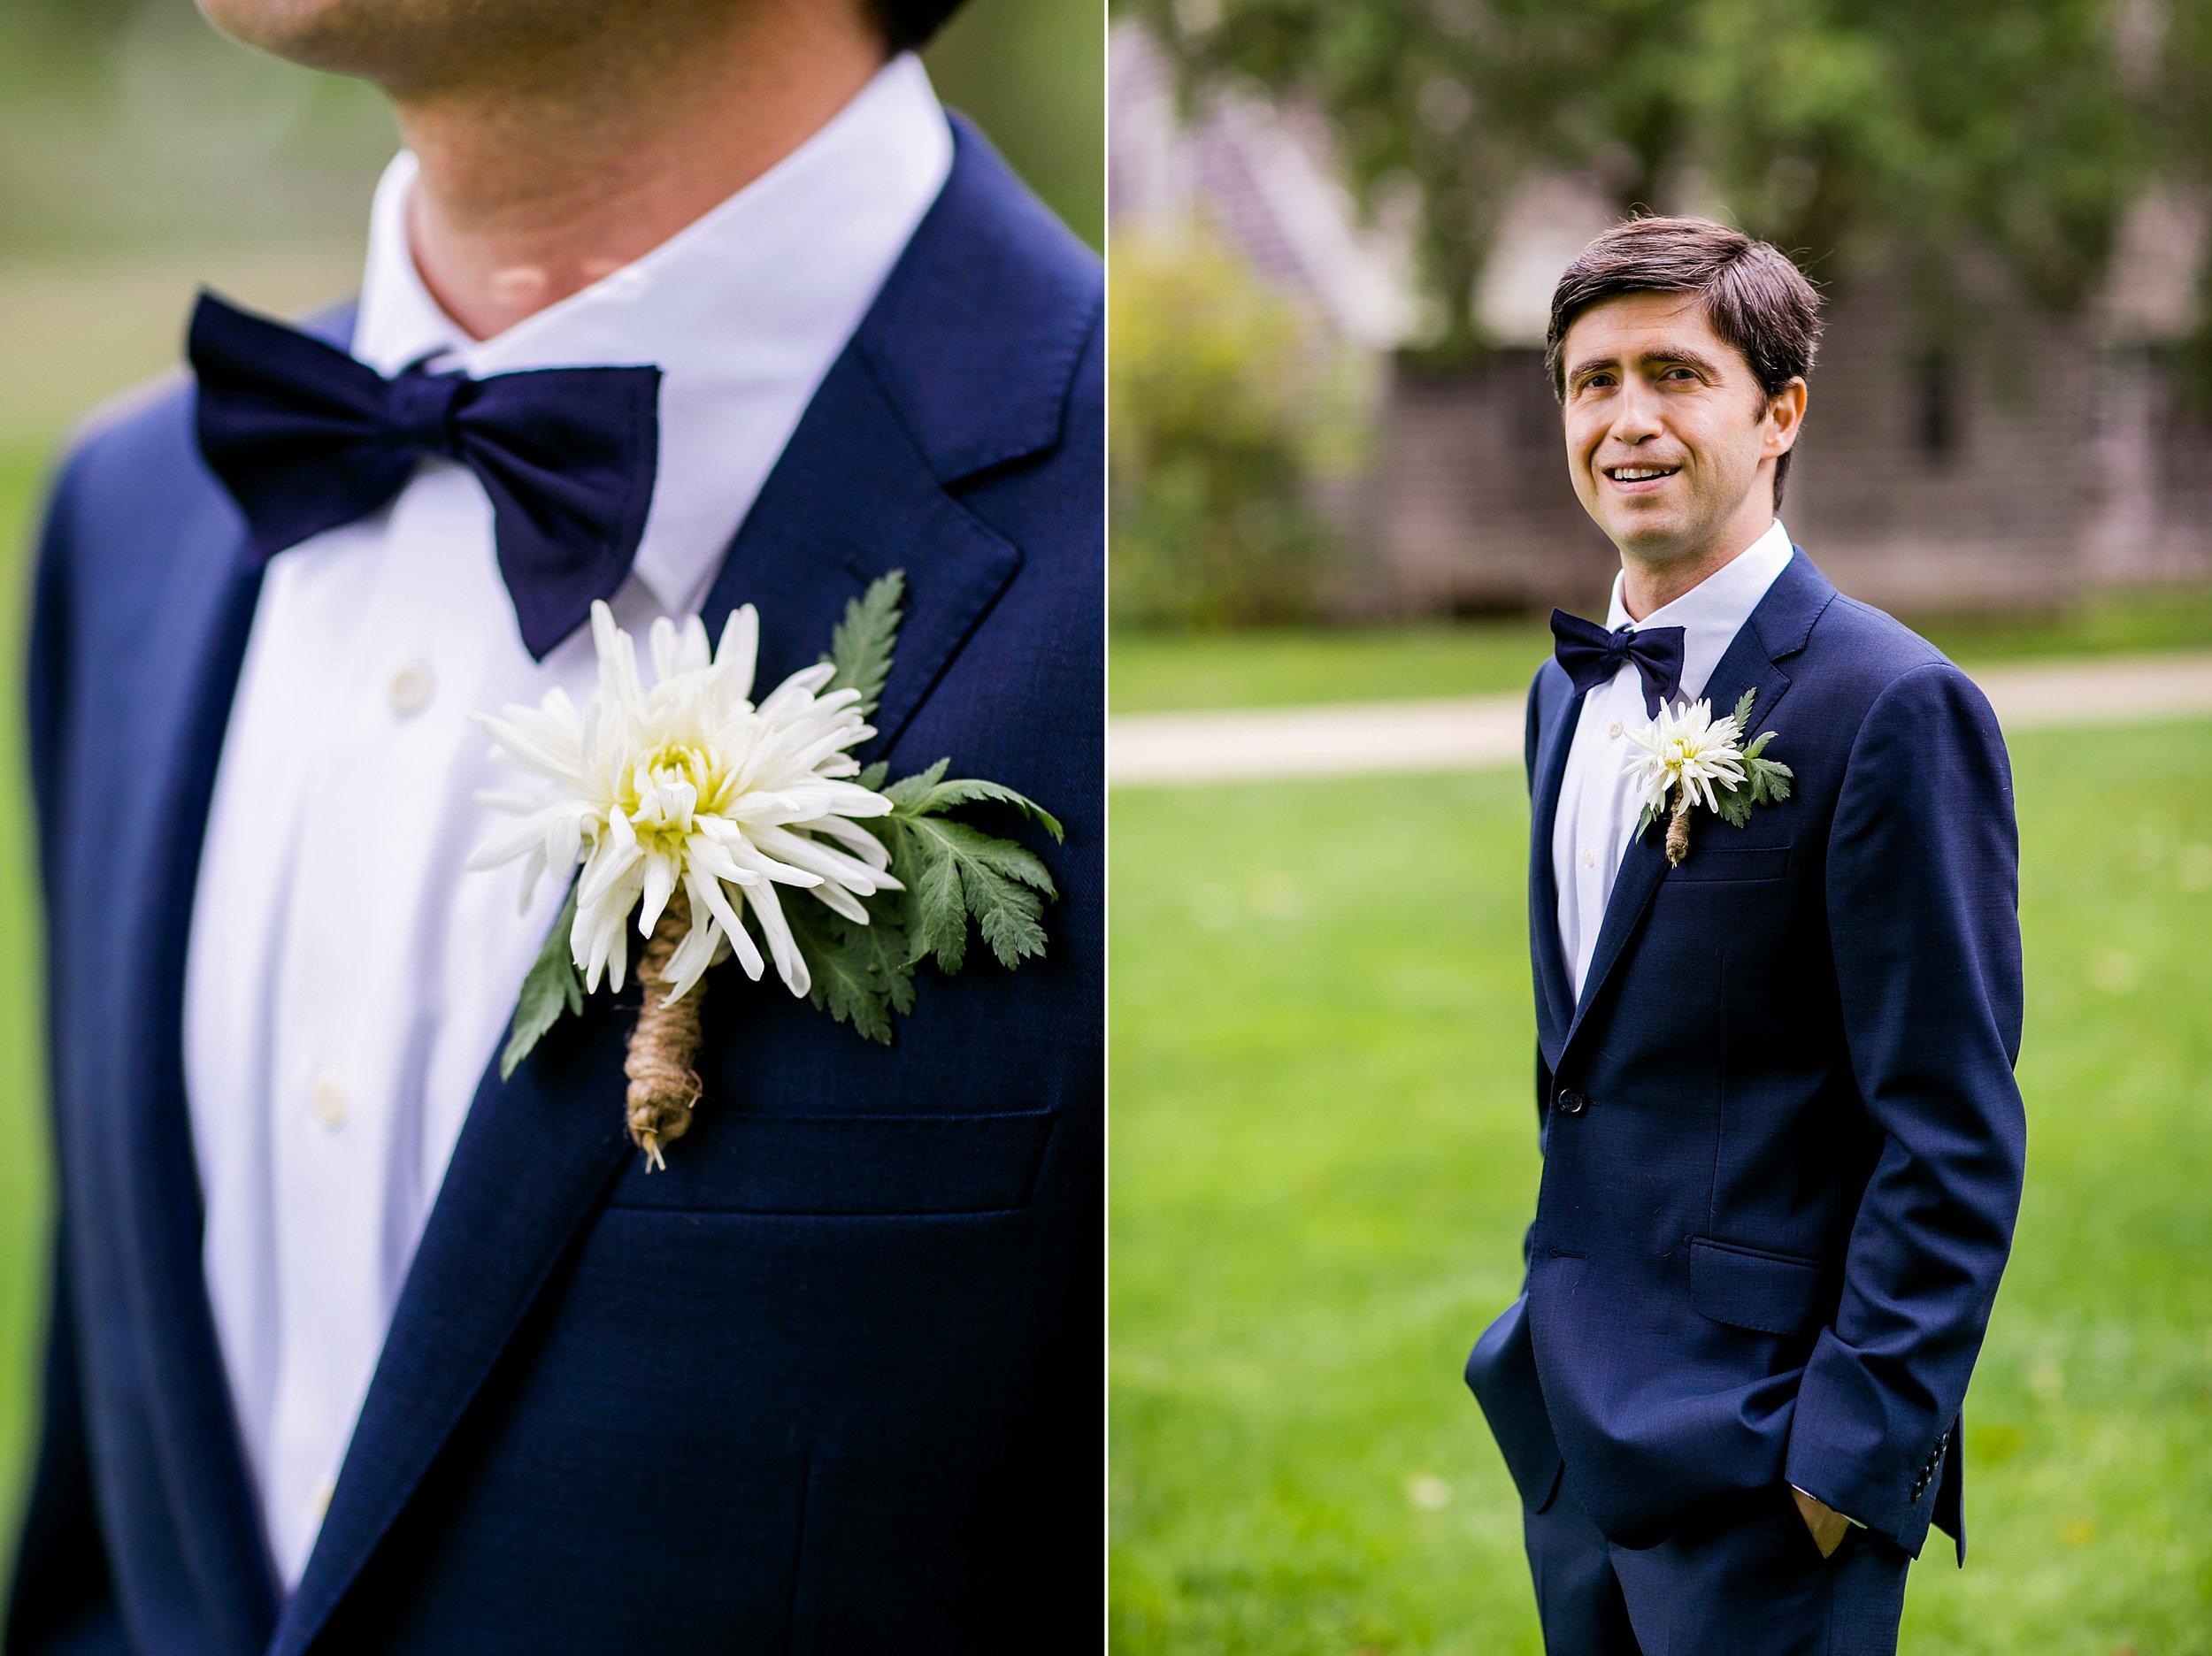 019 marthas vineyard wedding photographer todd danforth photography.jpg